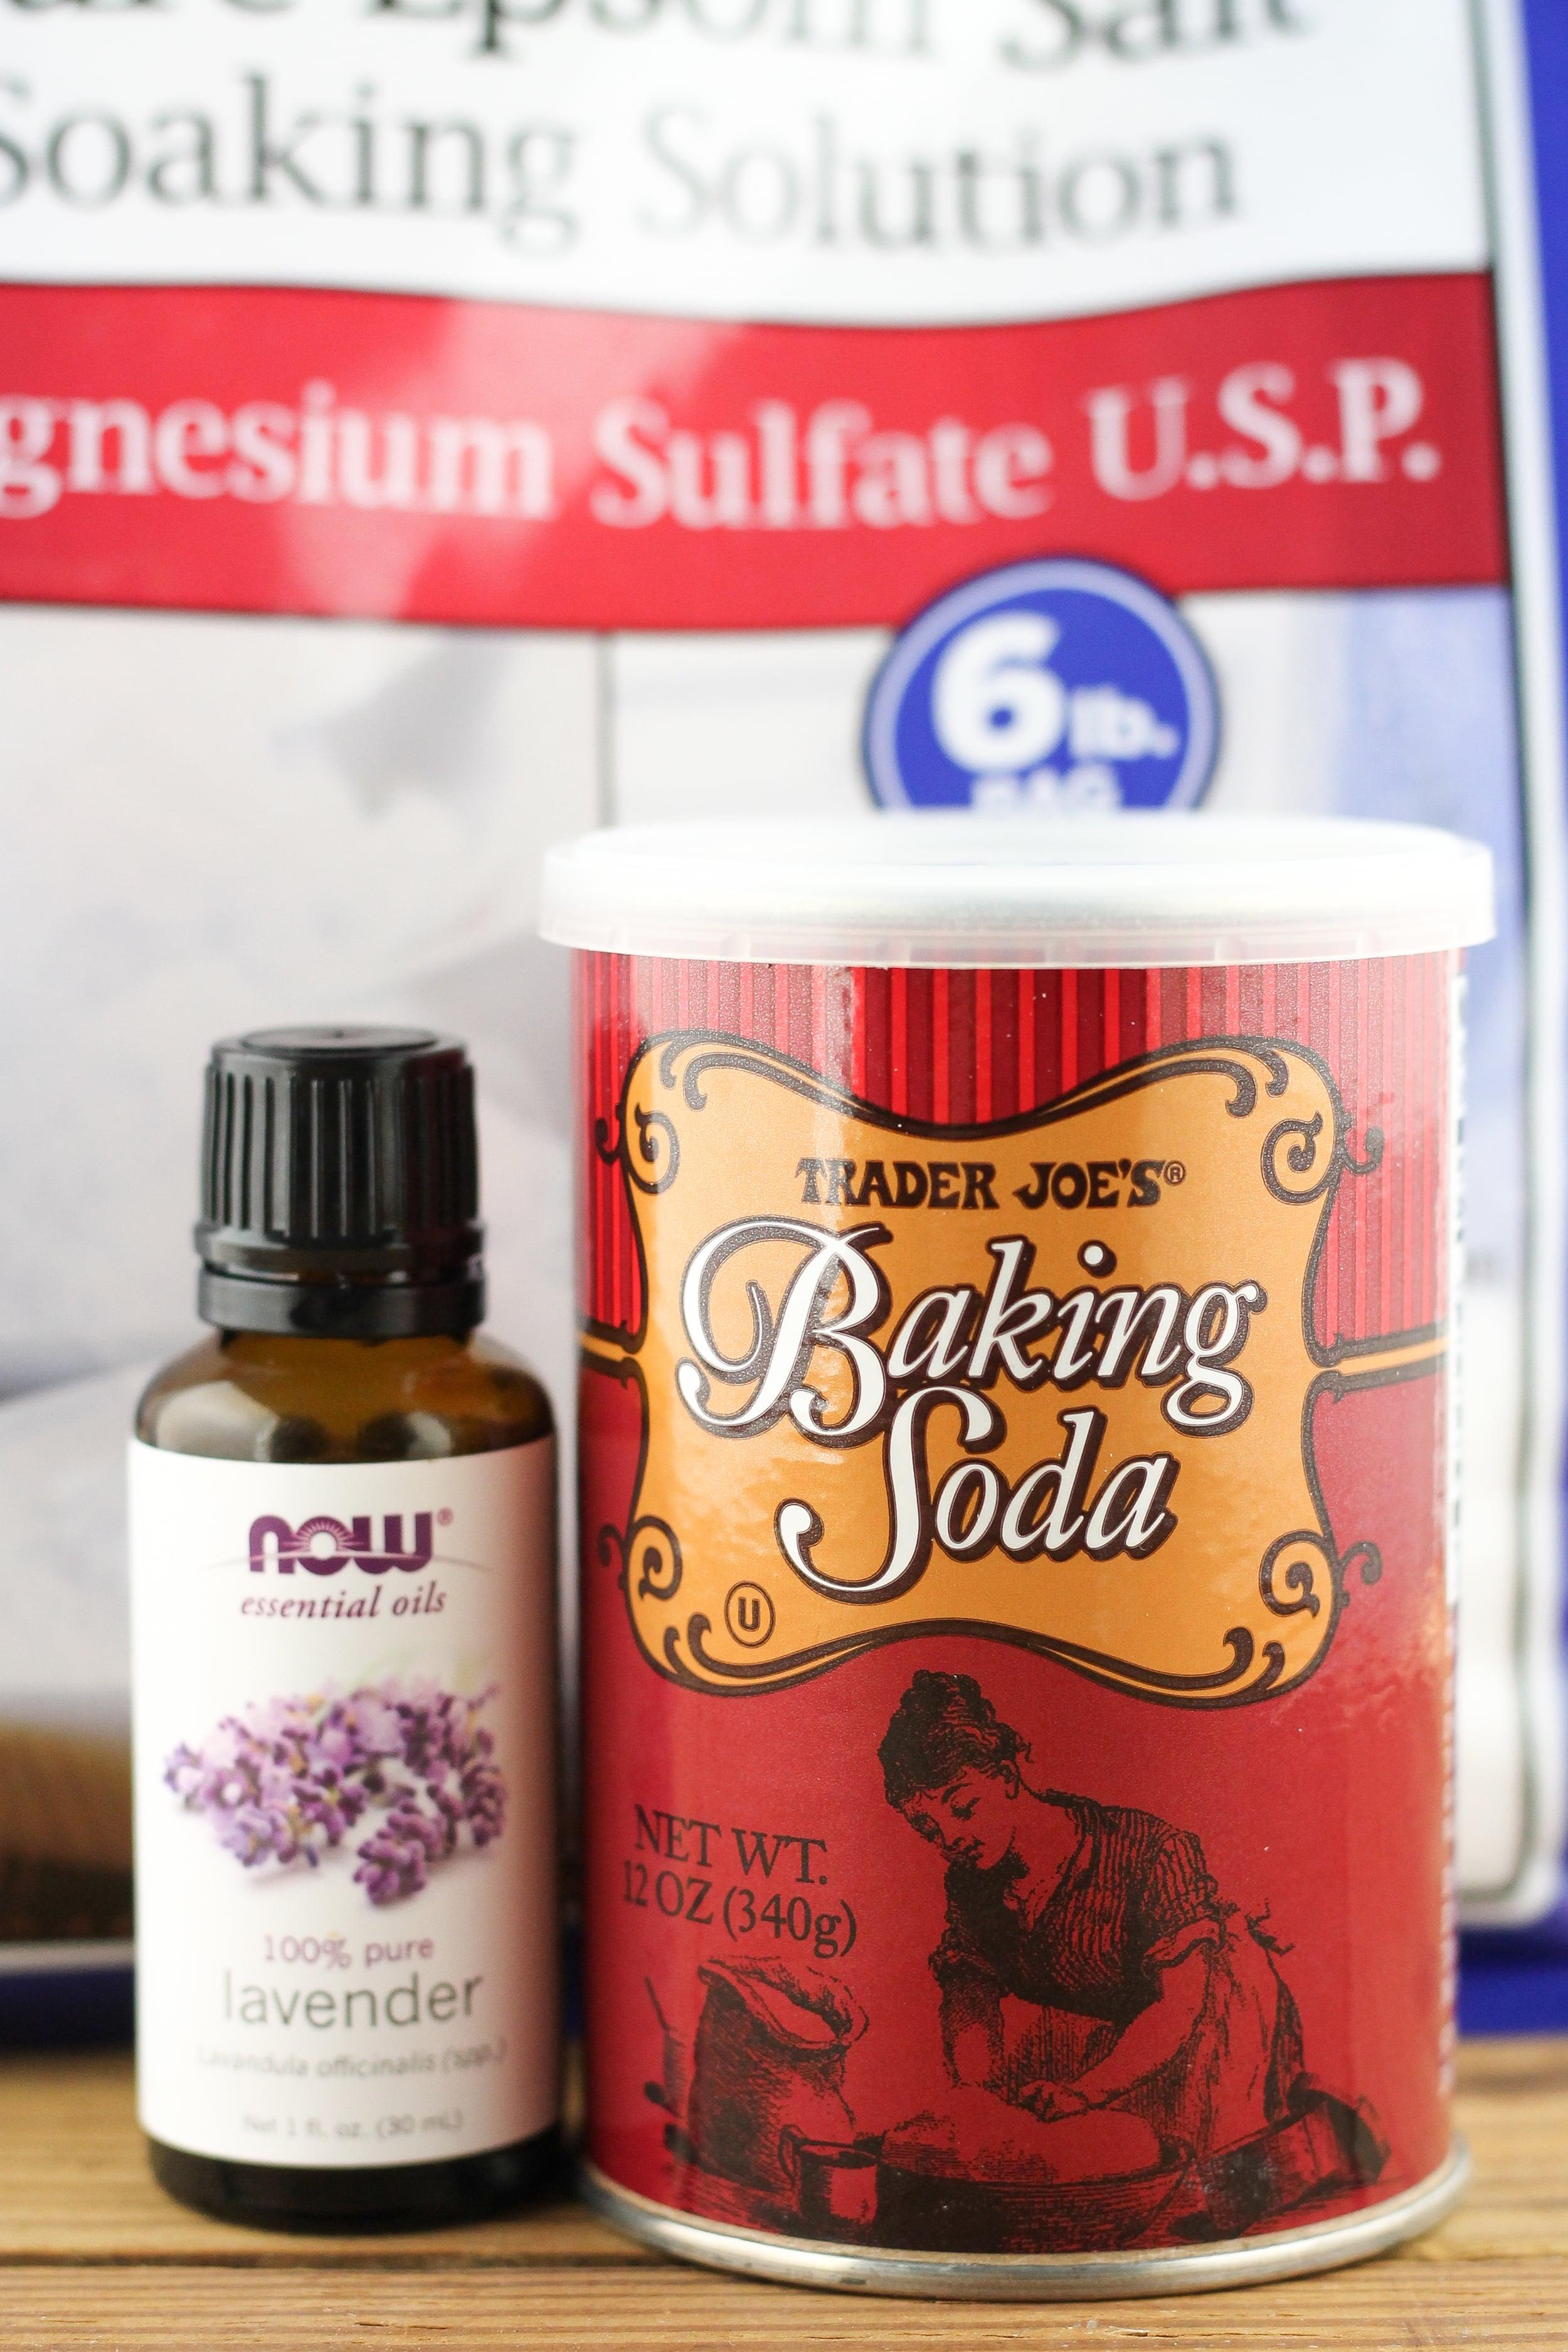 epsom salt bath, baking soda, essential oil